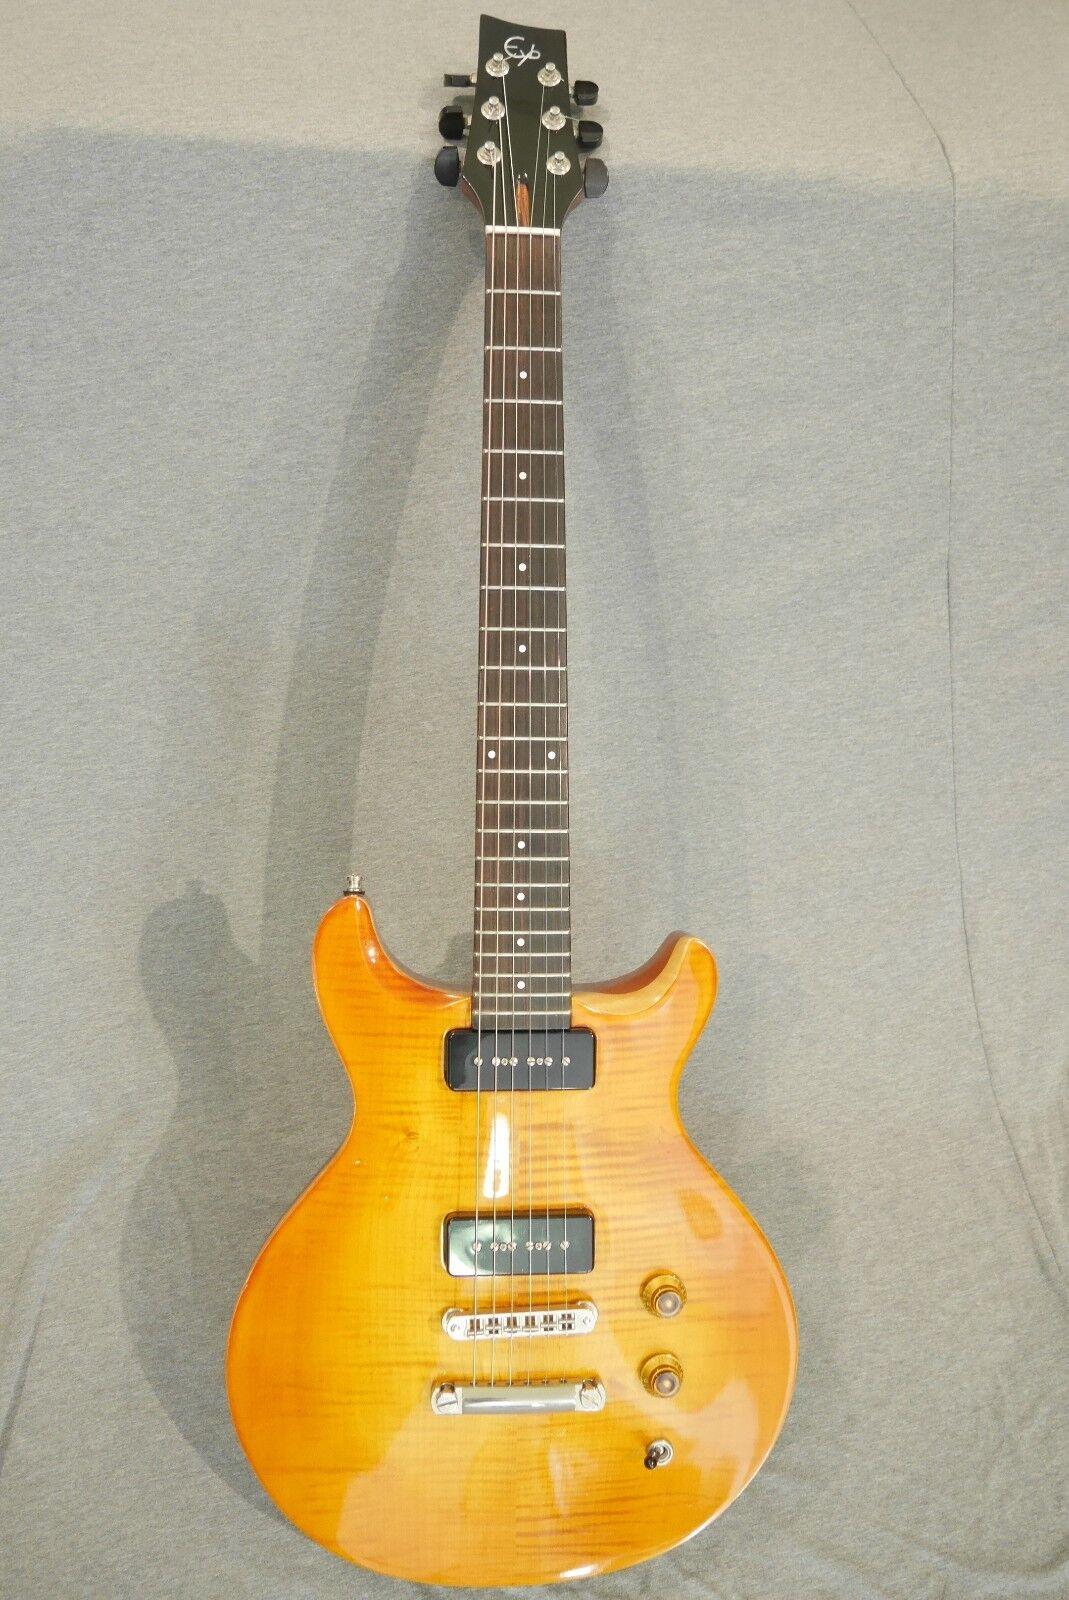 Eyb Classic Archtop E-Gitarre Handmade